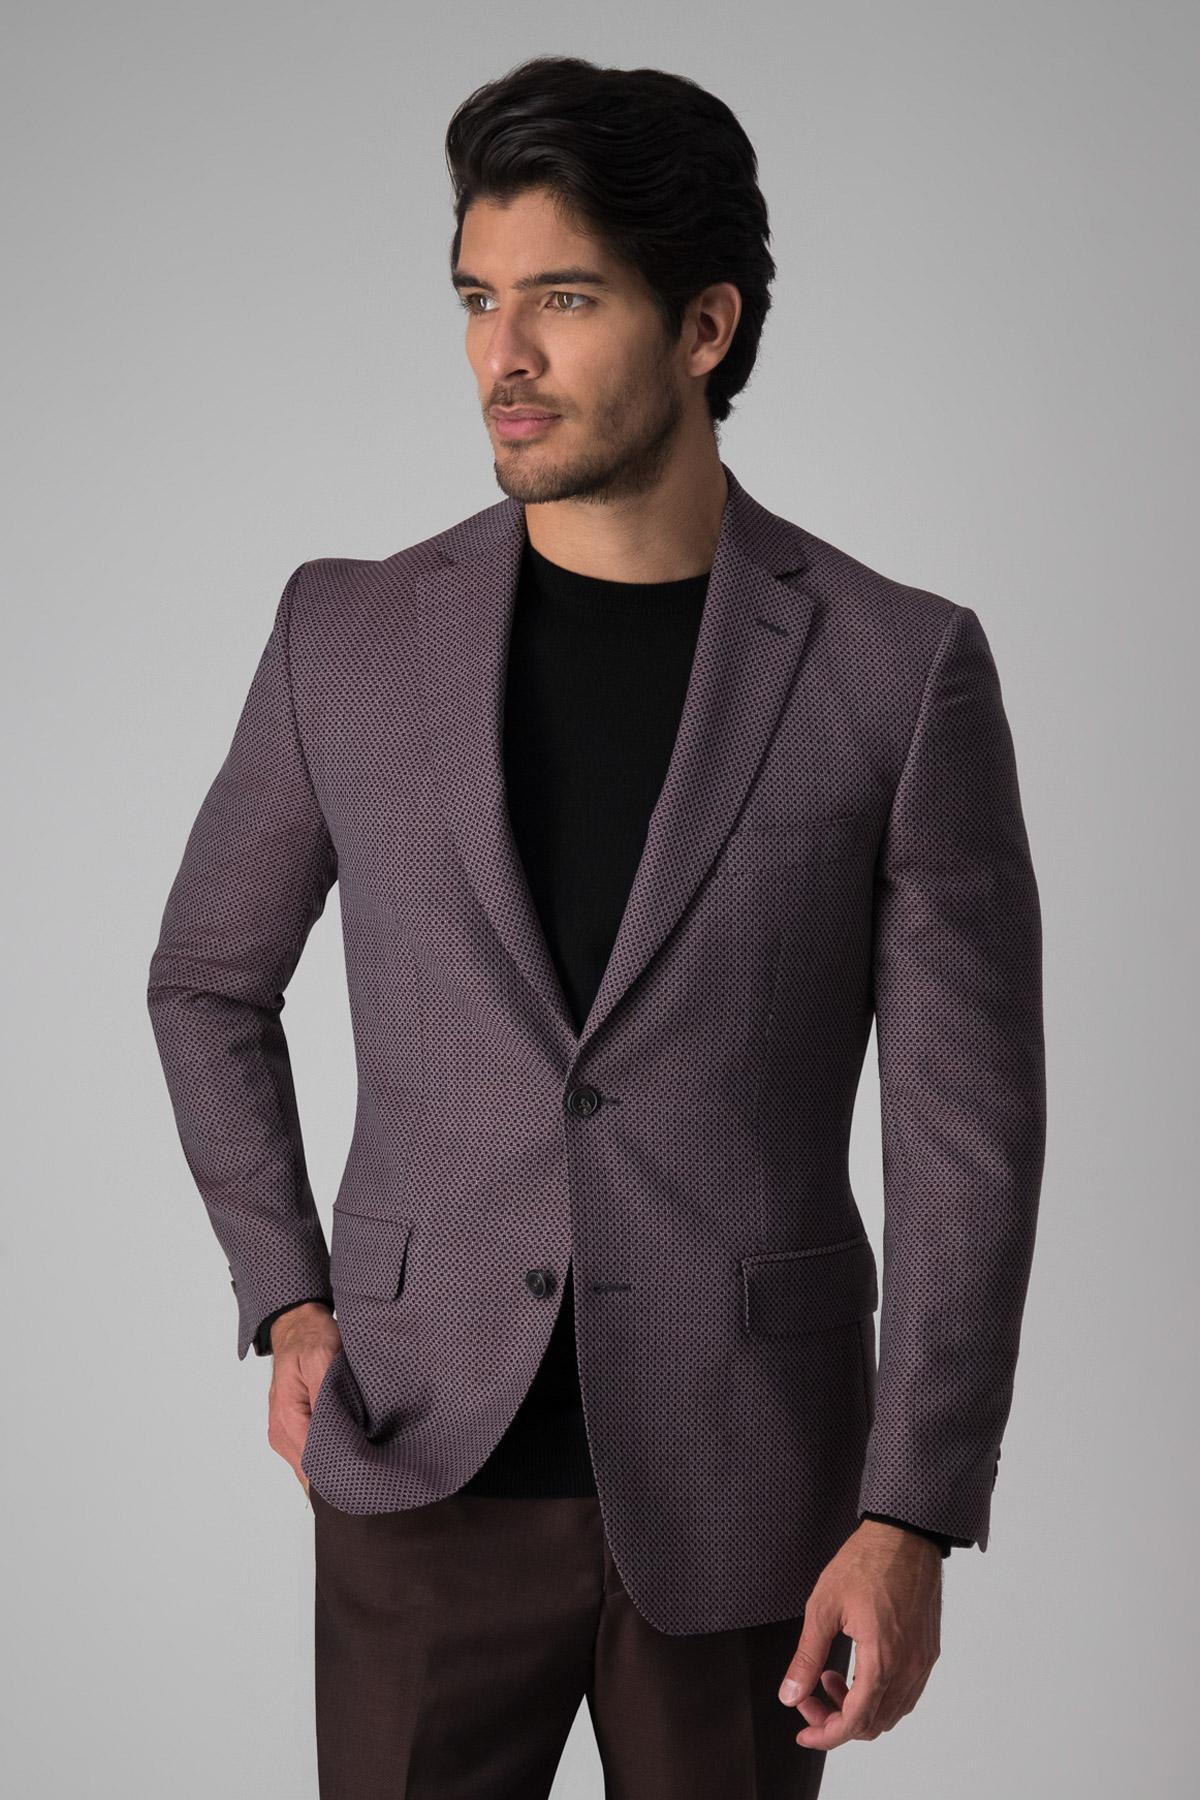 Saco Calderoni, 100%lana tela italiana, slim fit, fantasía color vino.